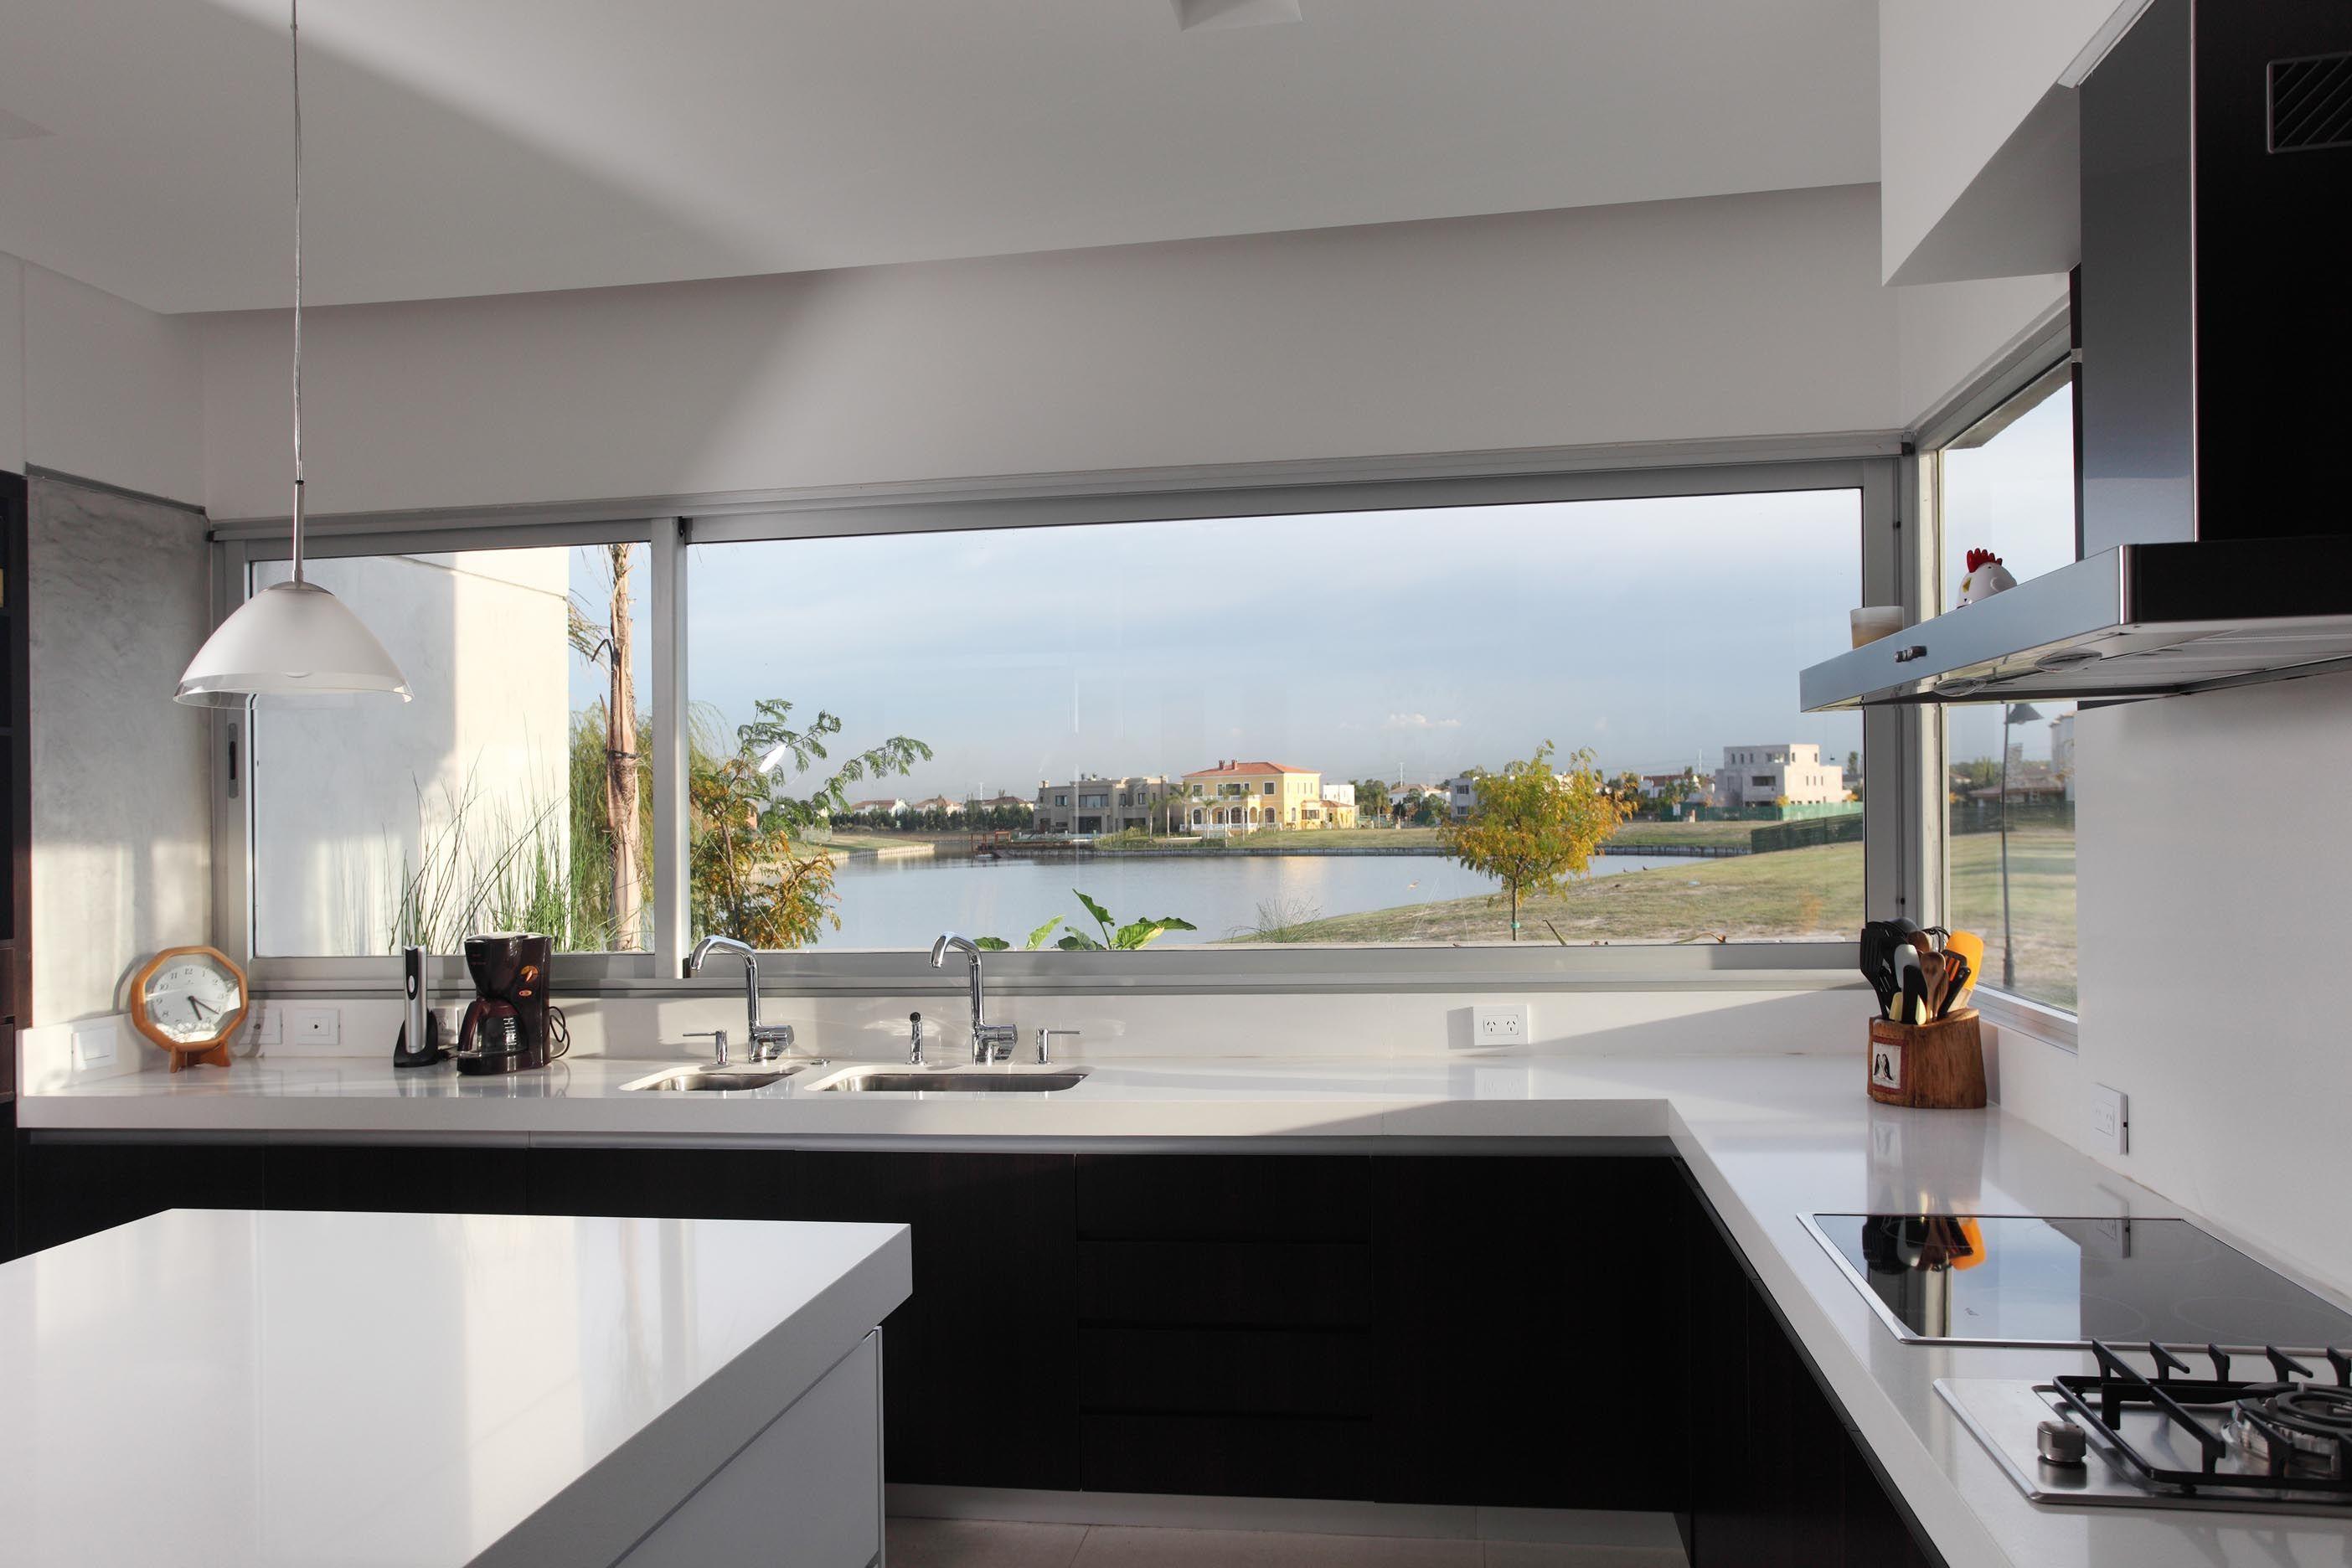 Black And White House Interior Design Decosee Com Minimalist Kitchen Interiors Minimalist Home Decor Minimalist Interior Design